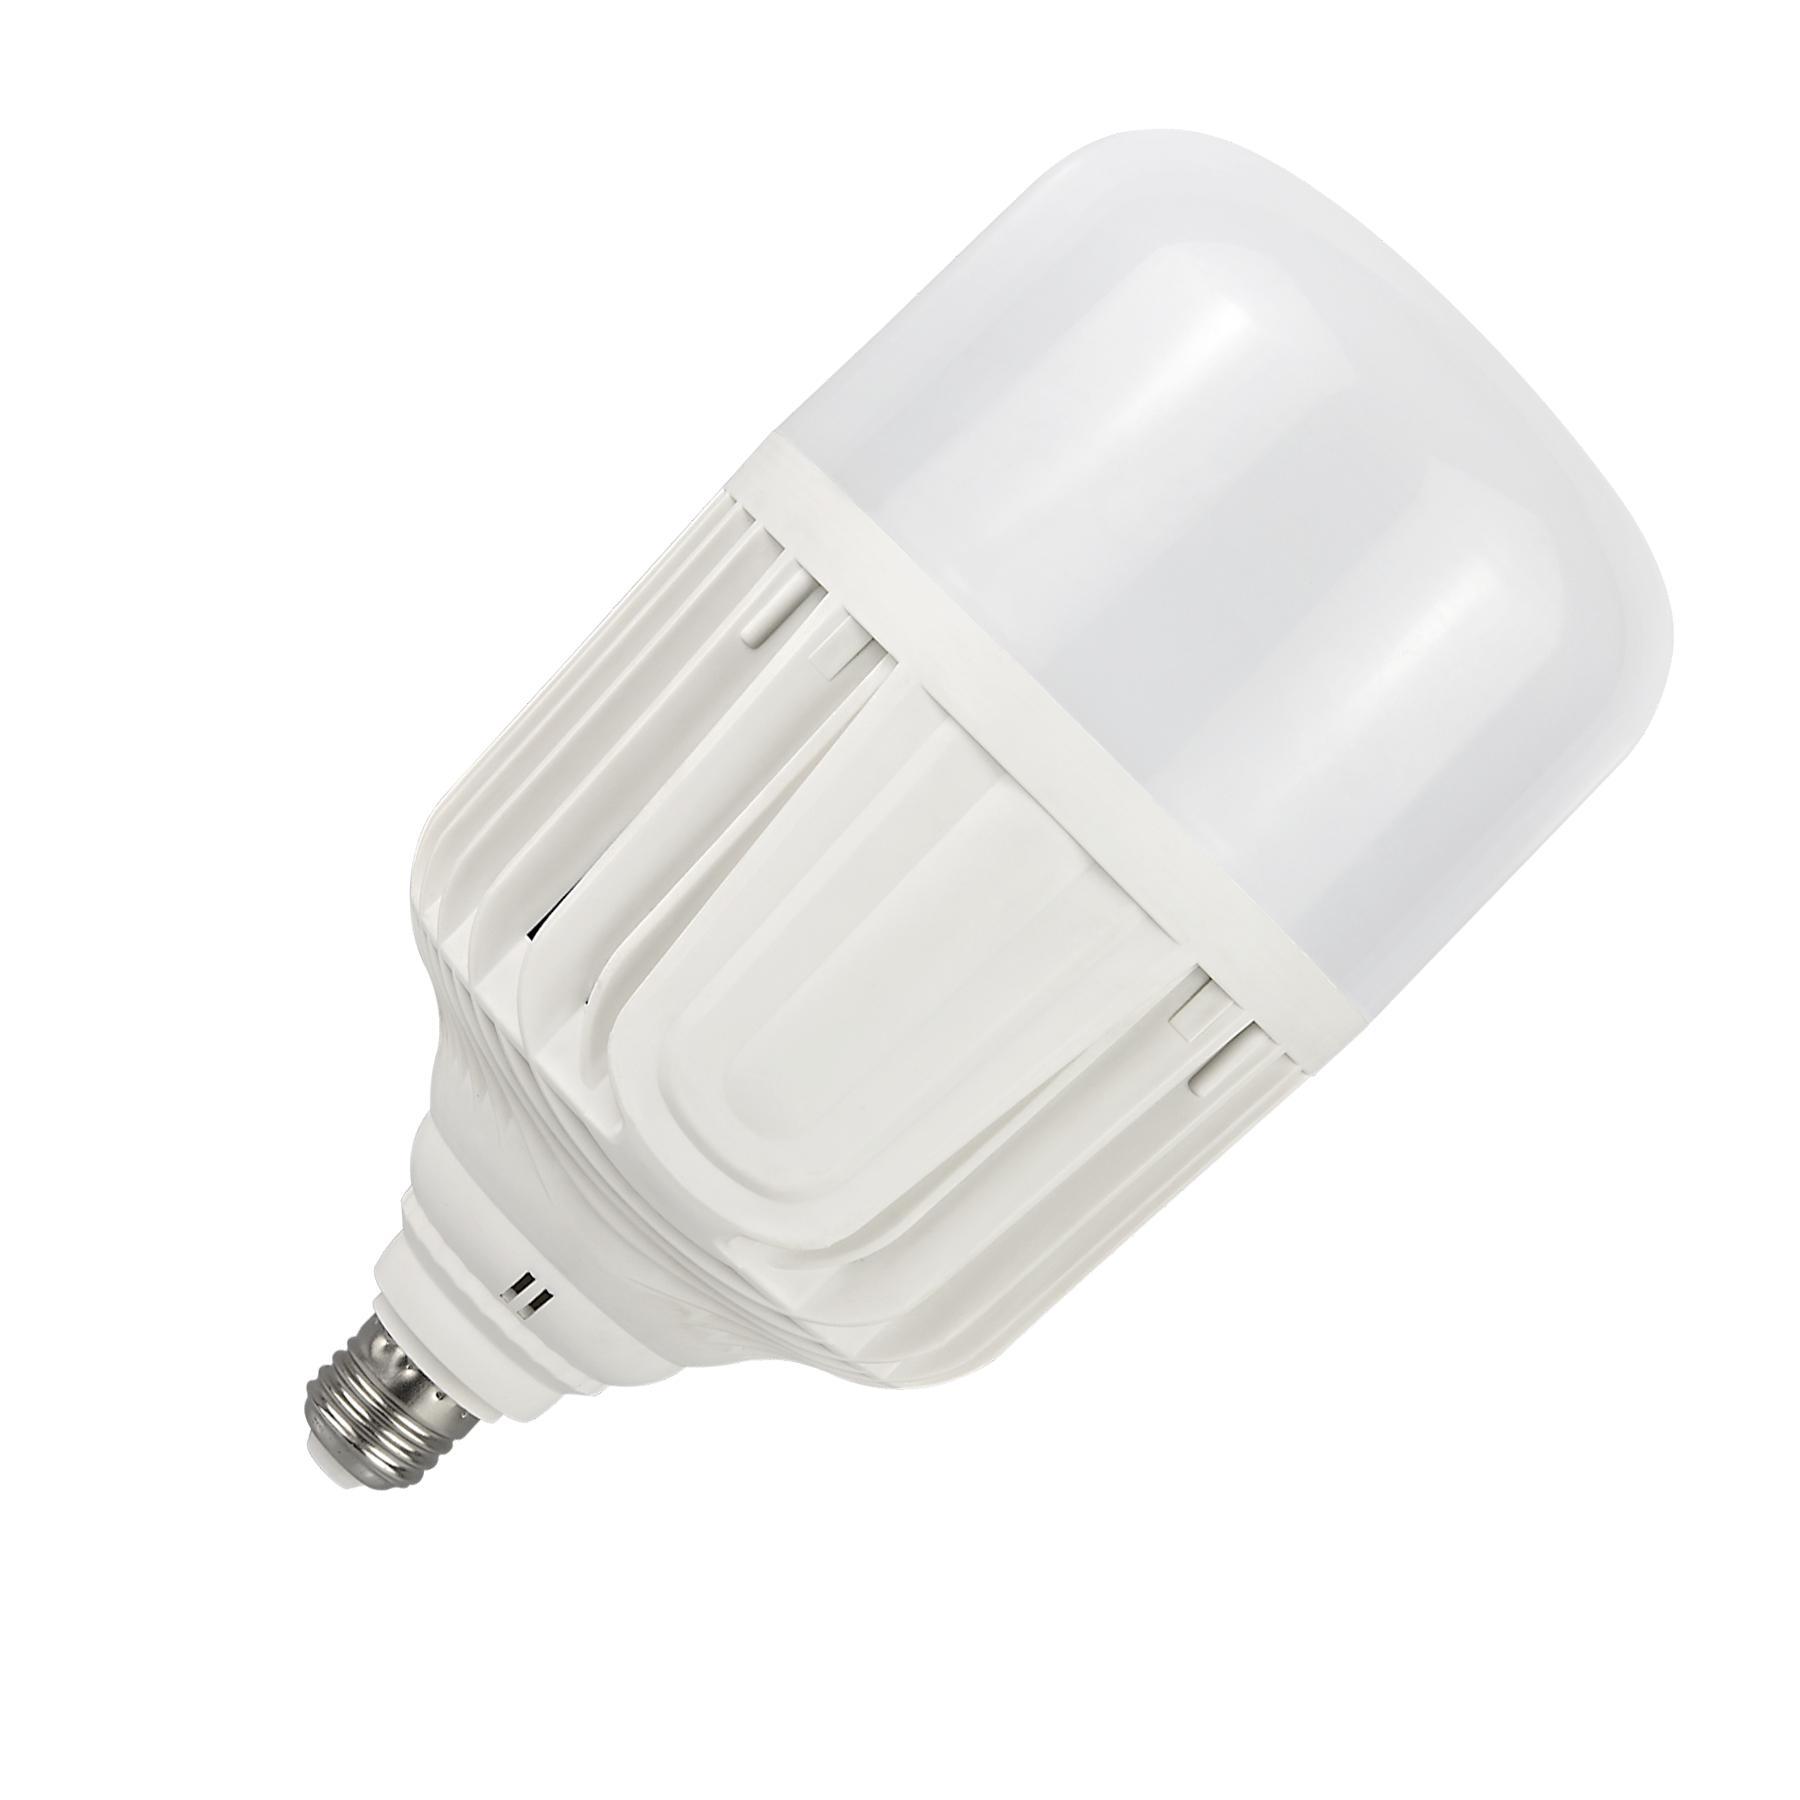 Лампа X-flash Xf-e40-t160-200w-4000k-230v